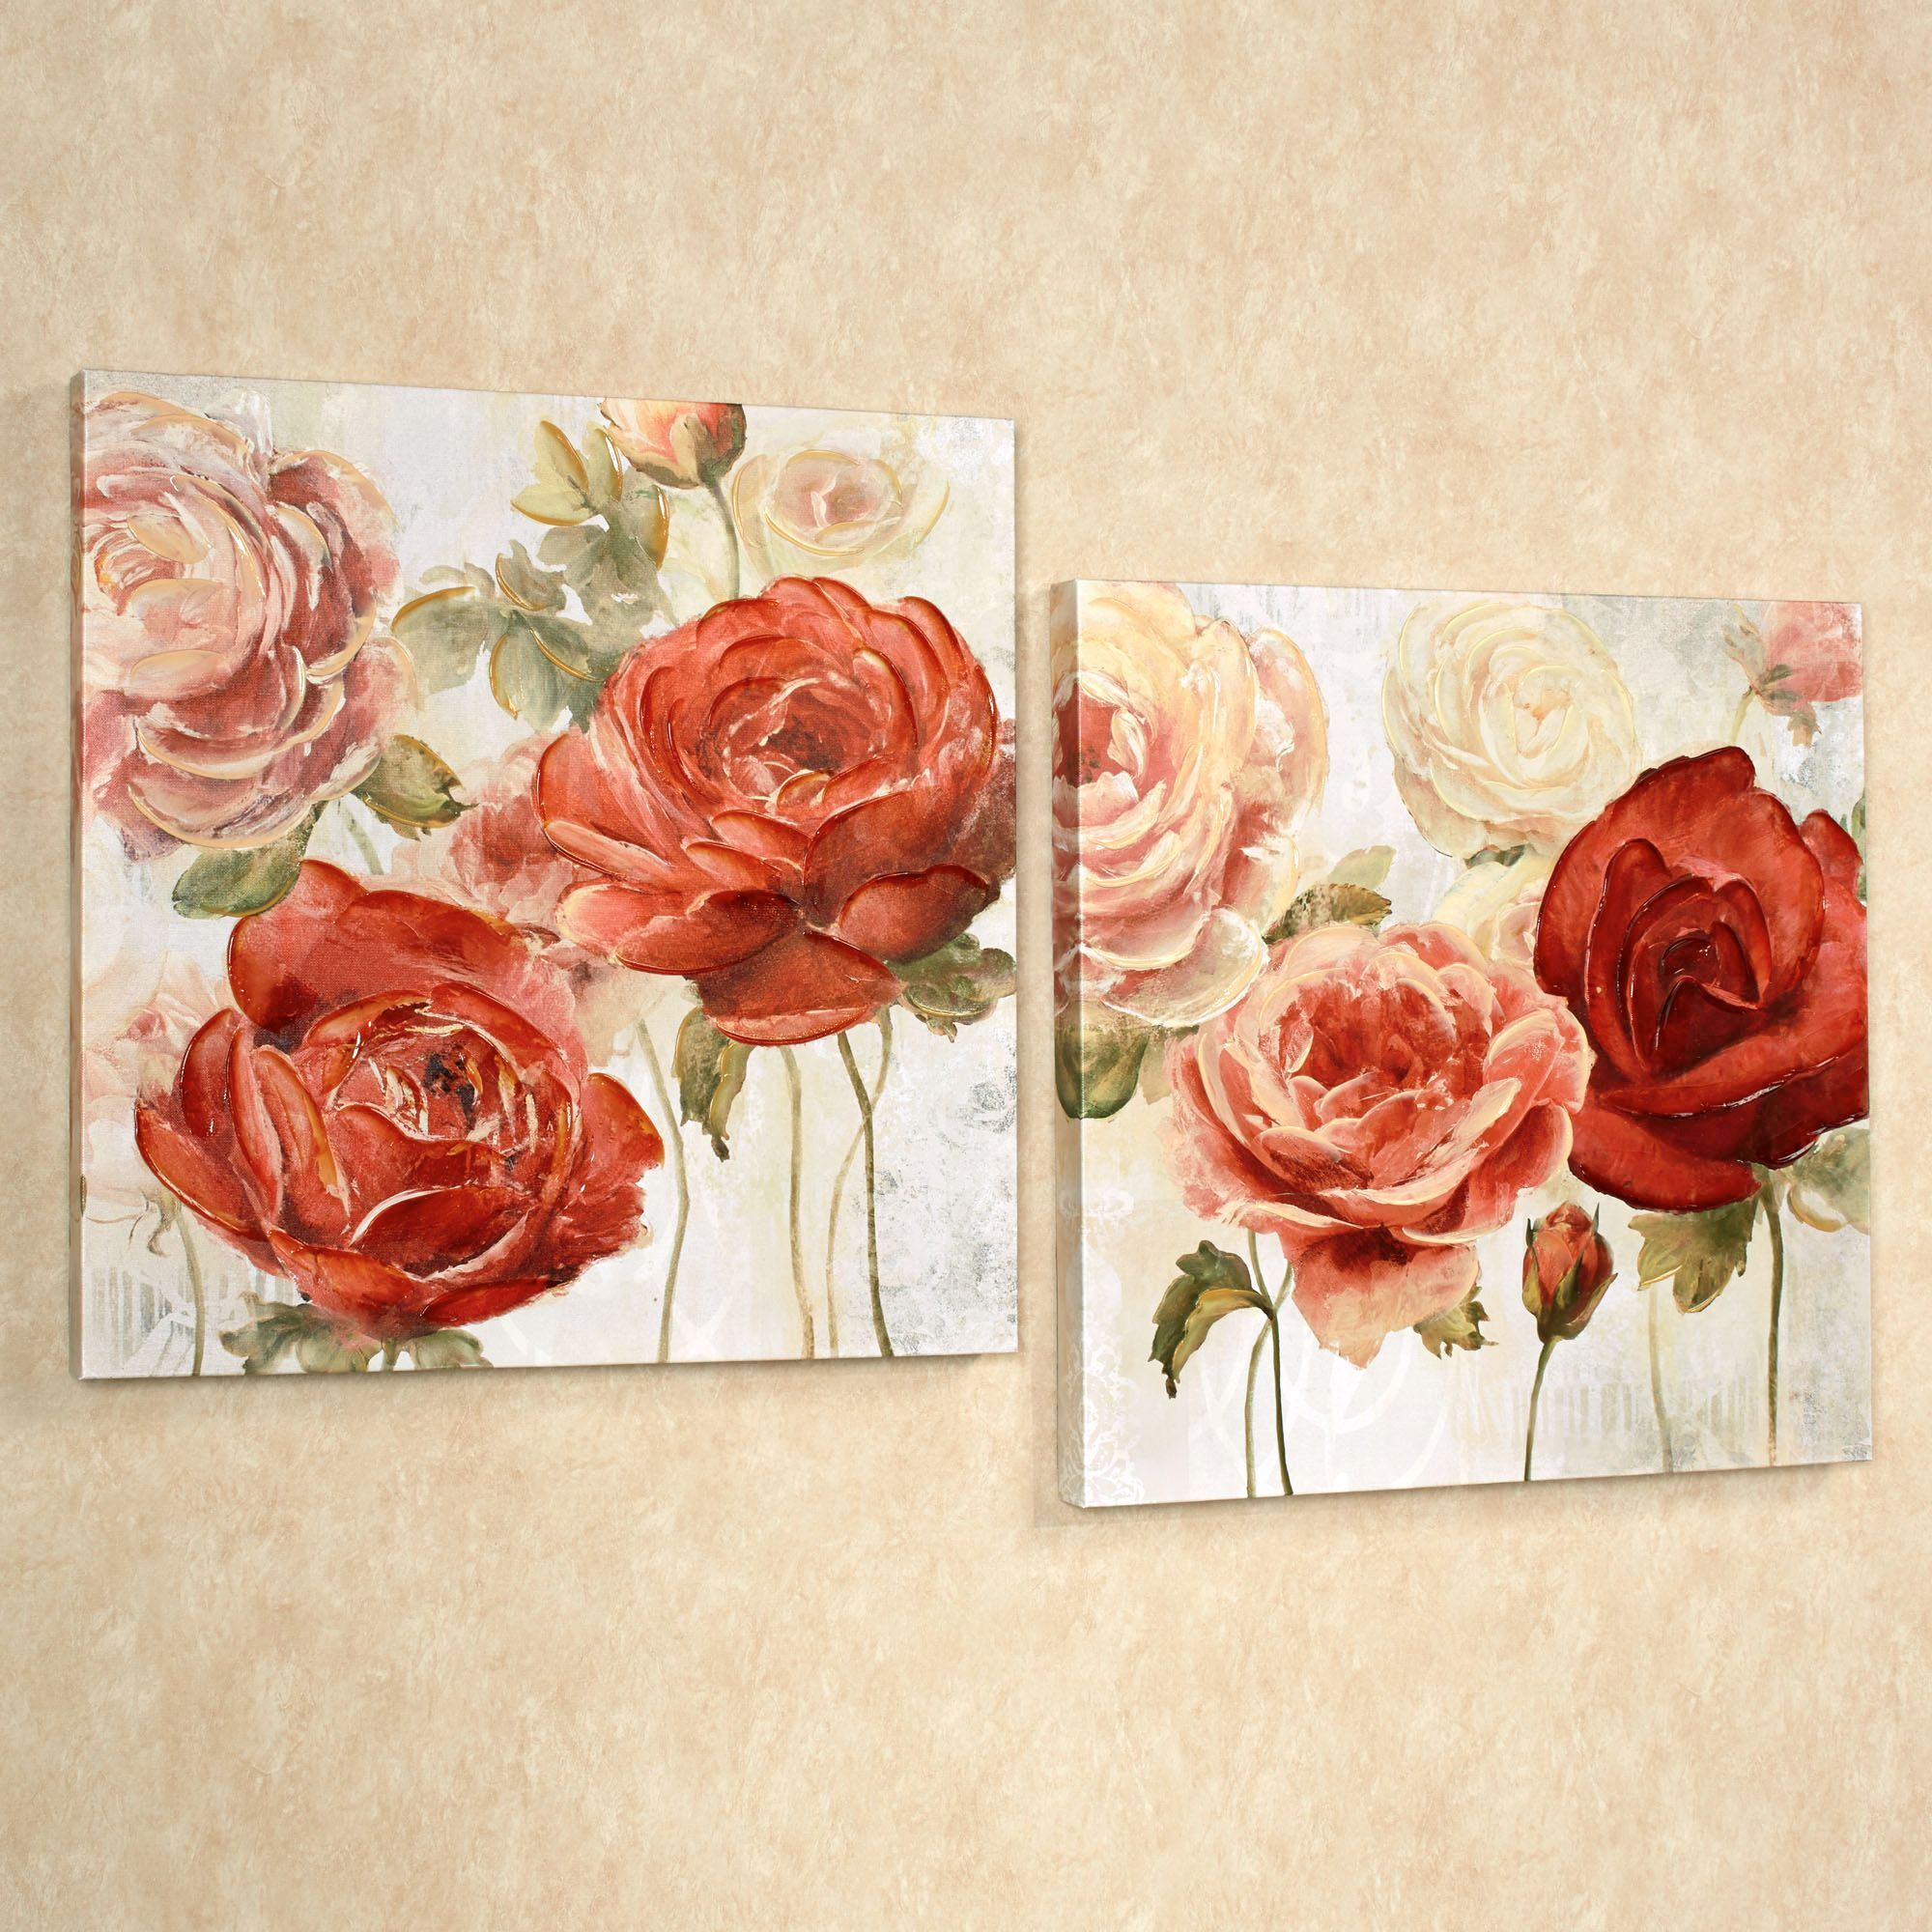 radiant blooms rose floral canvas wall art set